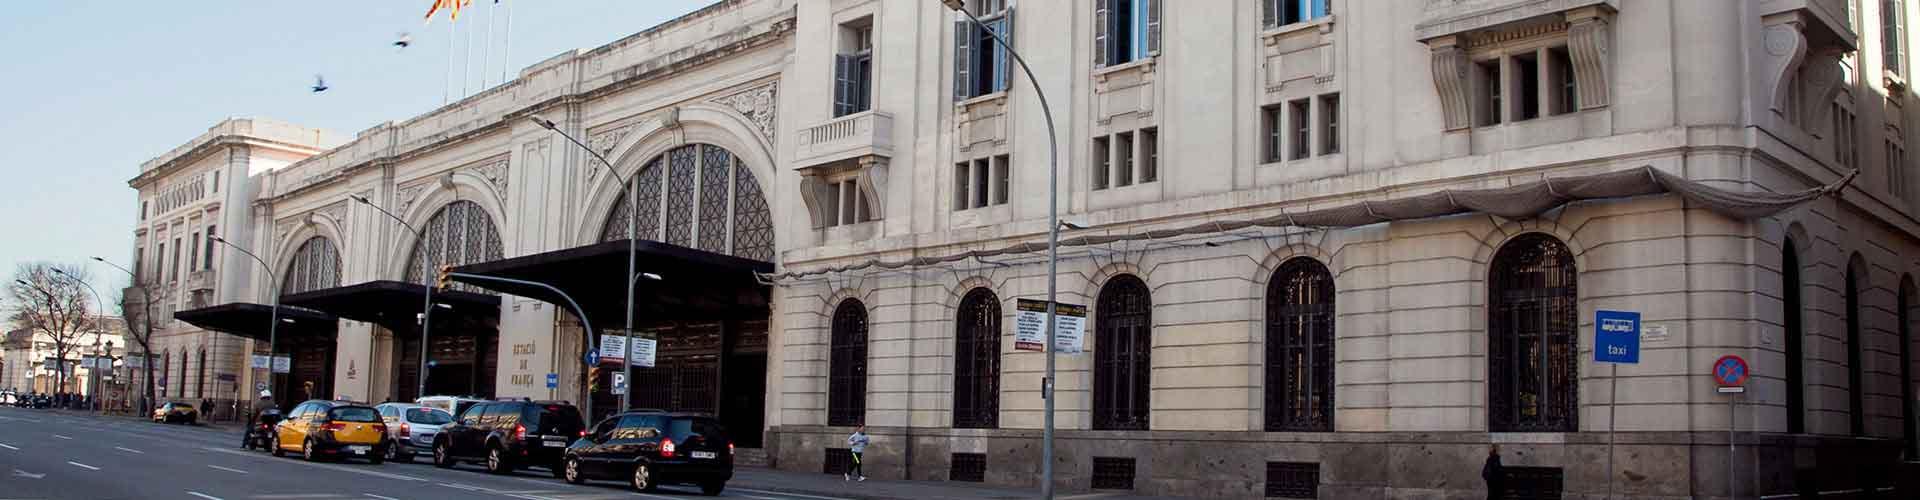 Barcelona - Apartamentos cerca a Estación de tren de França. Mapas de Barcelona, Fotos y comentarios de cada Apartamento en Barcelona.